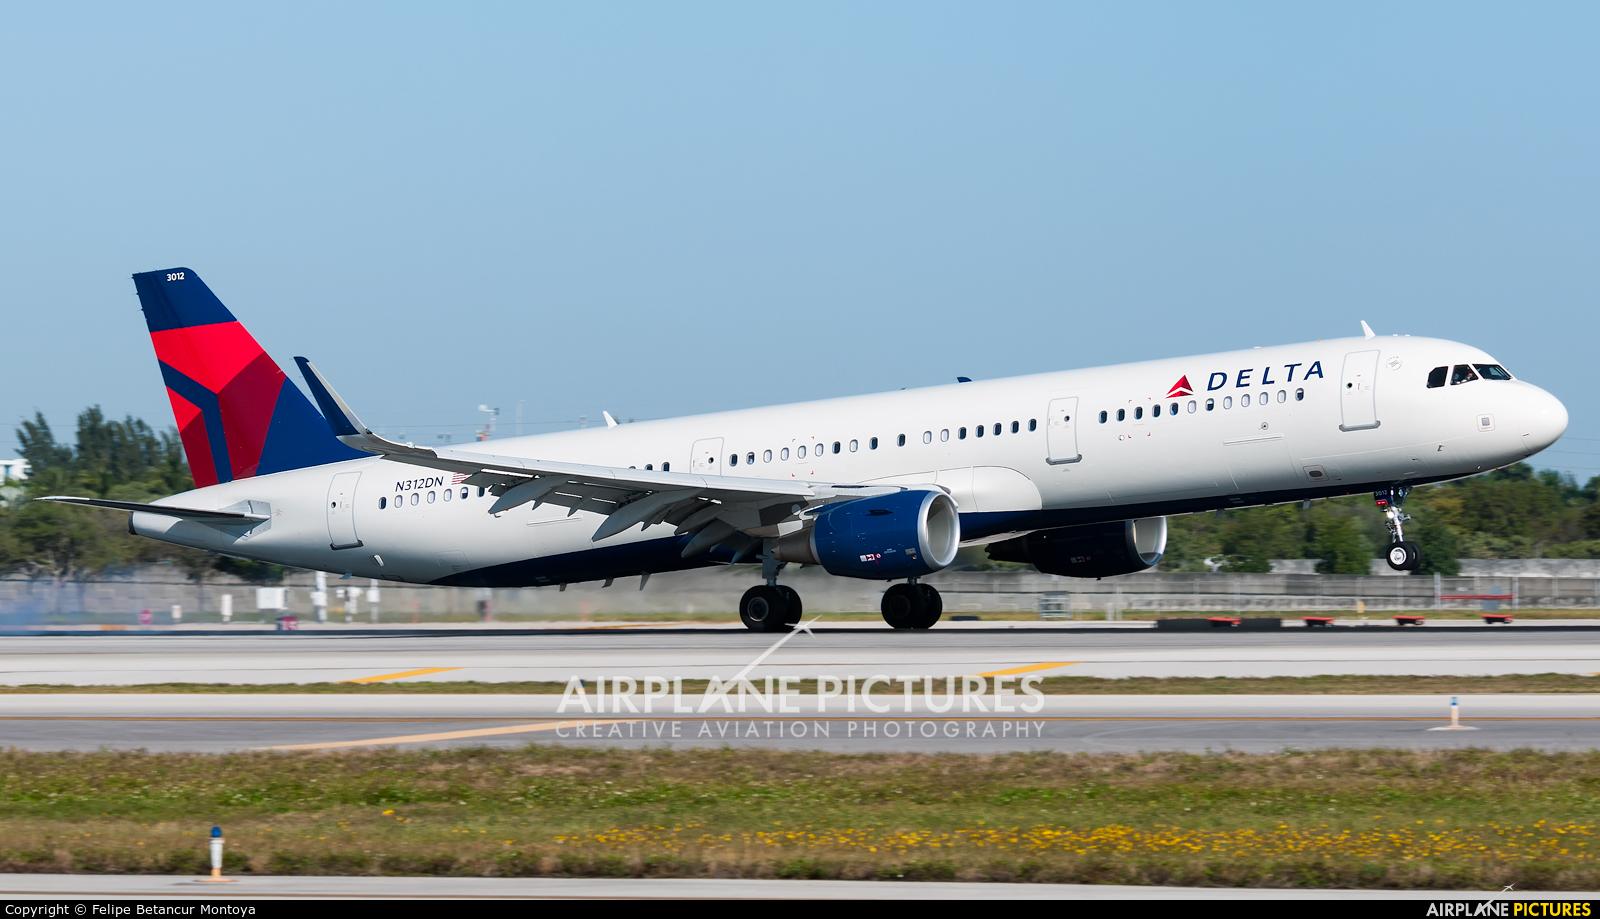 Delta Air Lines N312DN aircraft at Fort Lauderdale - Hollywood Intl